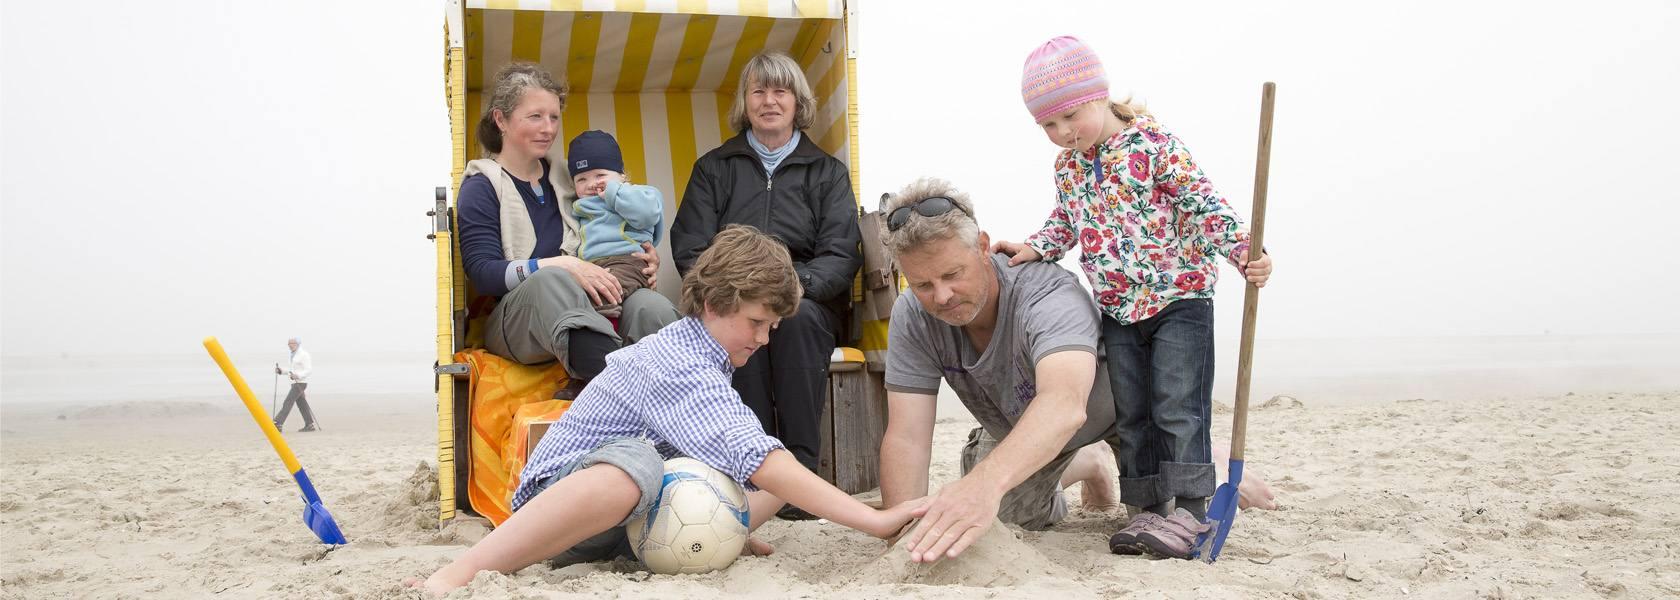 Familie am Strand, © Martin Stöver